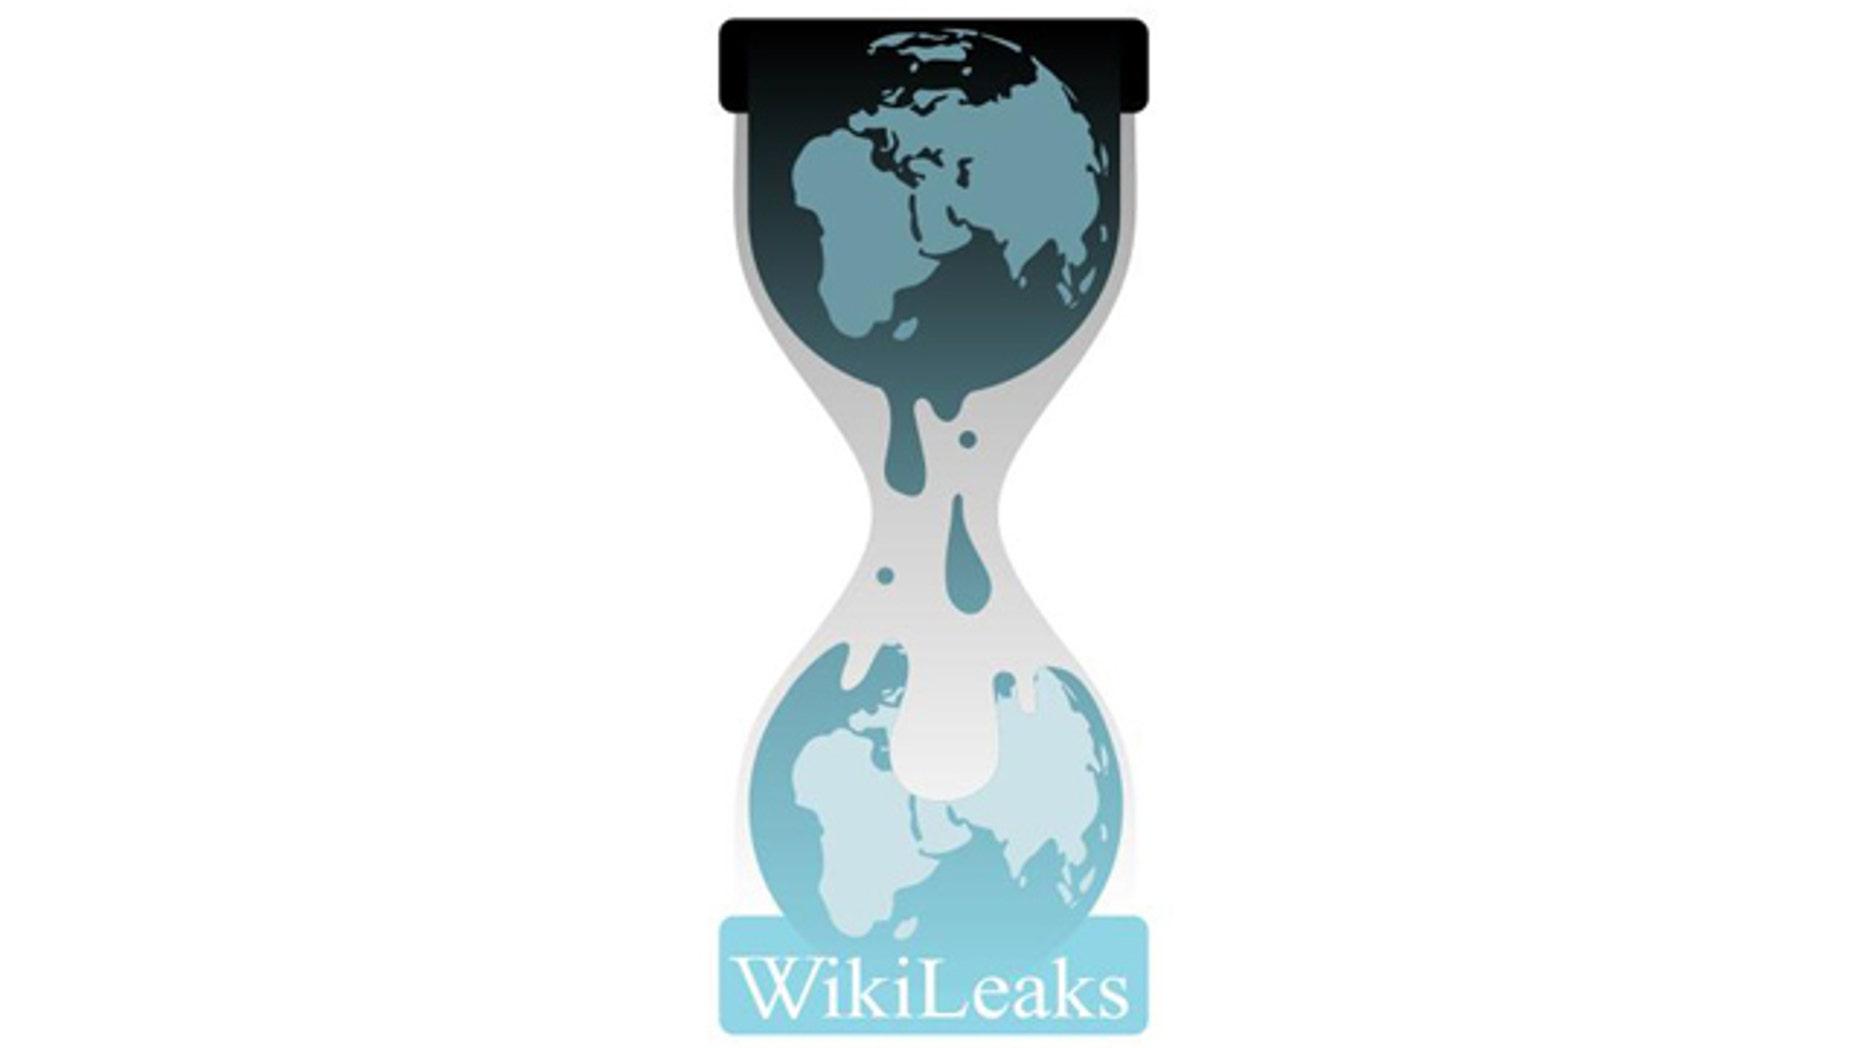 The logo for whistle-blower website WikiLeaks.